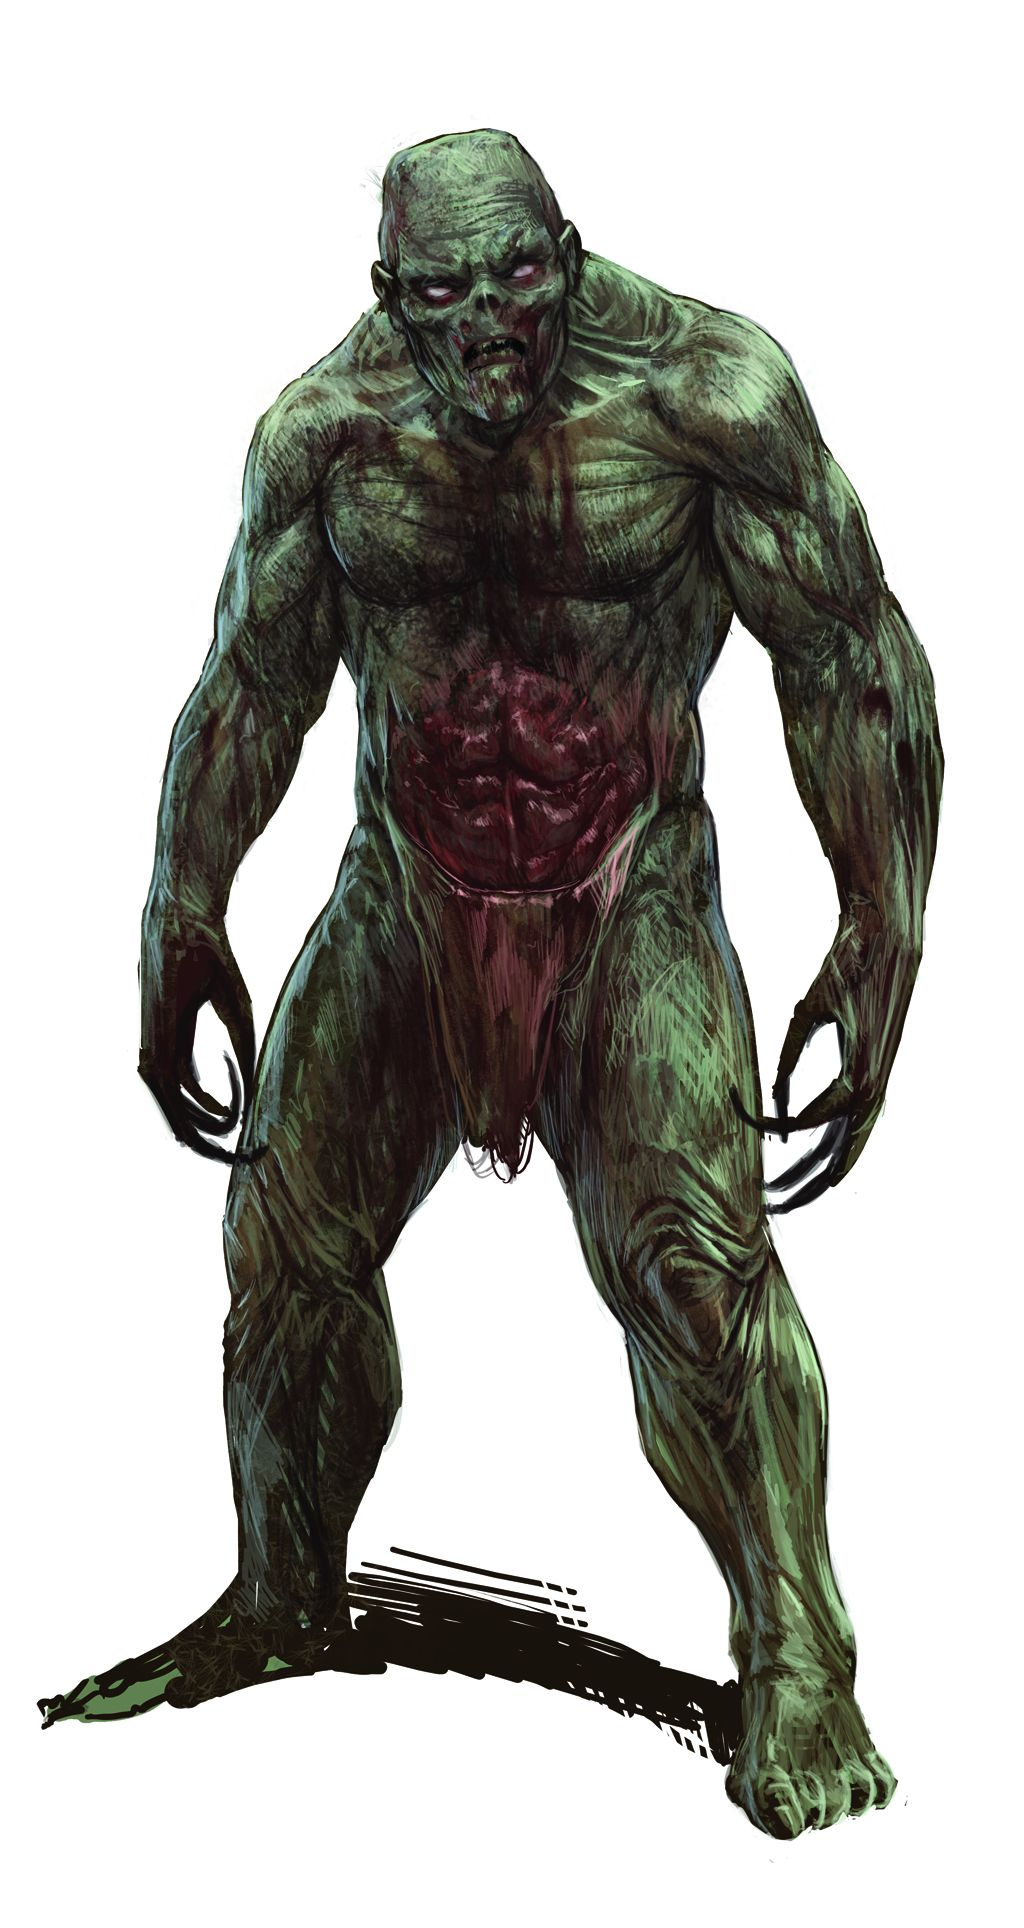 Ghoul3